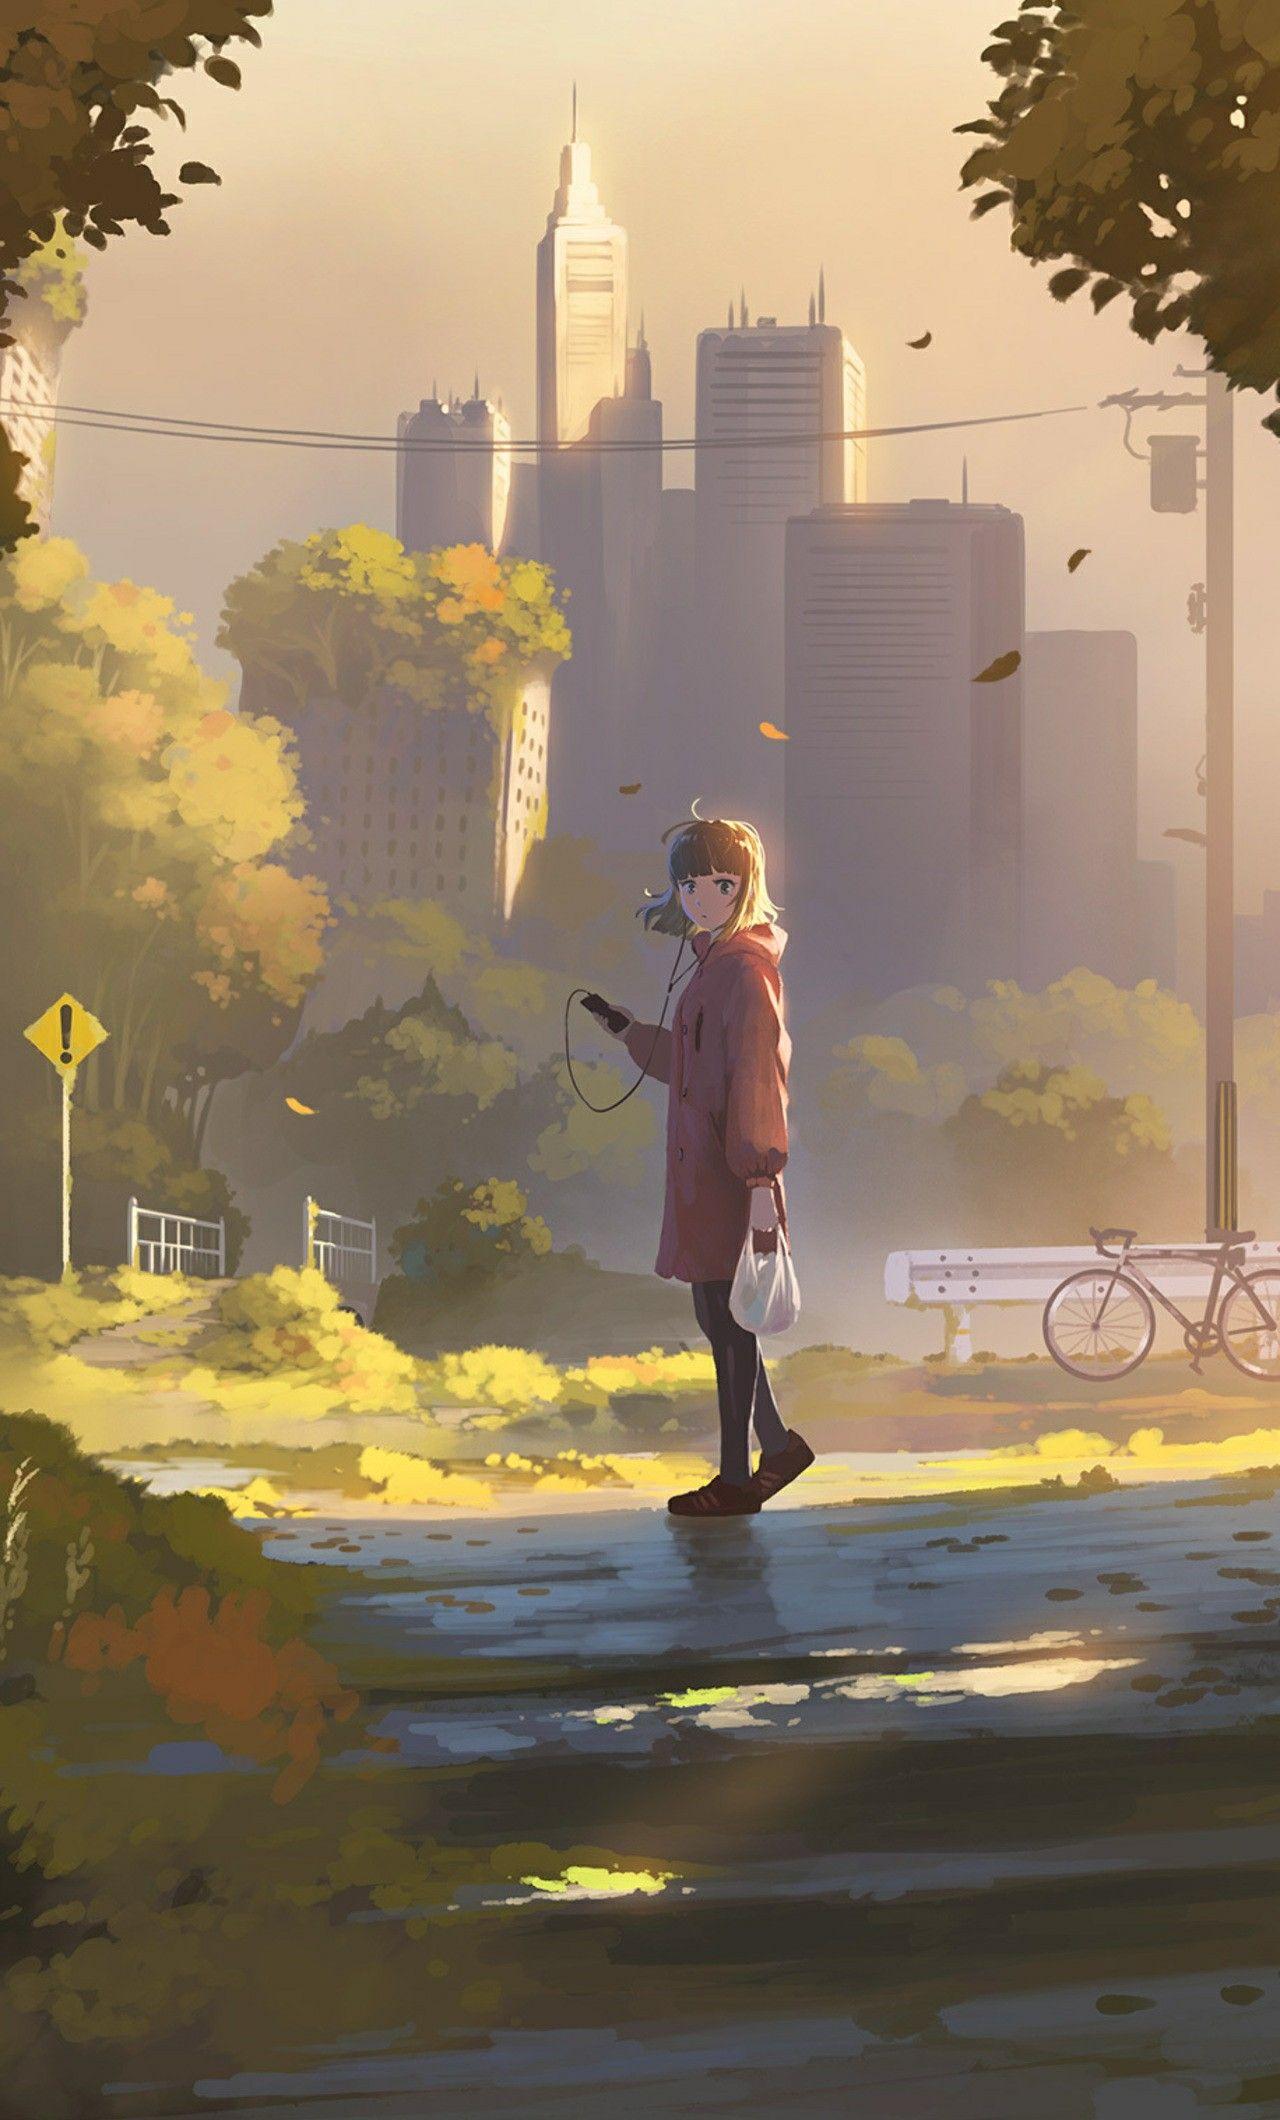 Pin By Tsukichanshabu On 2アニメ Anime Scenery Wallpaper Anime Art Anime Scenery